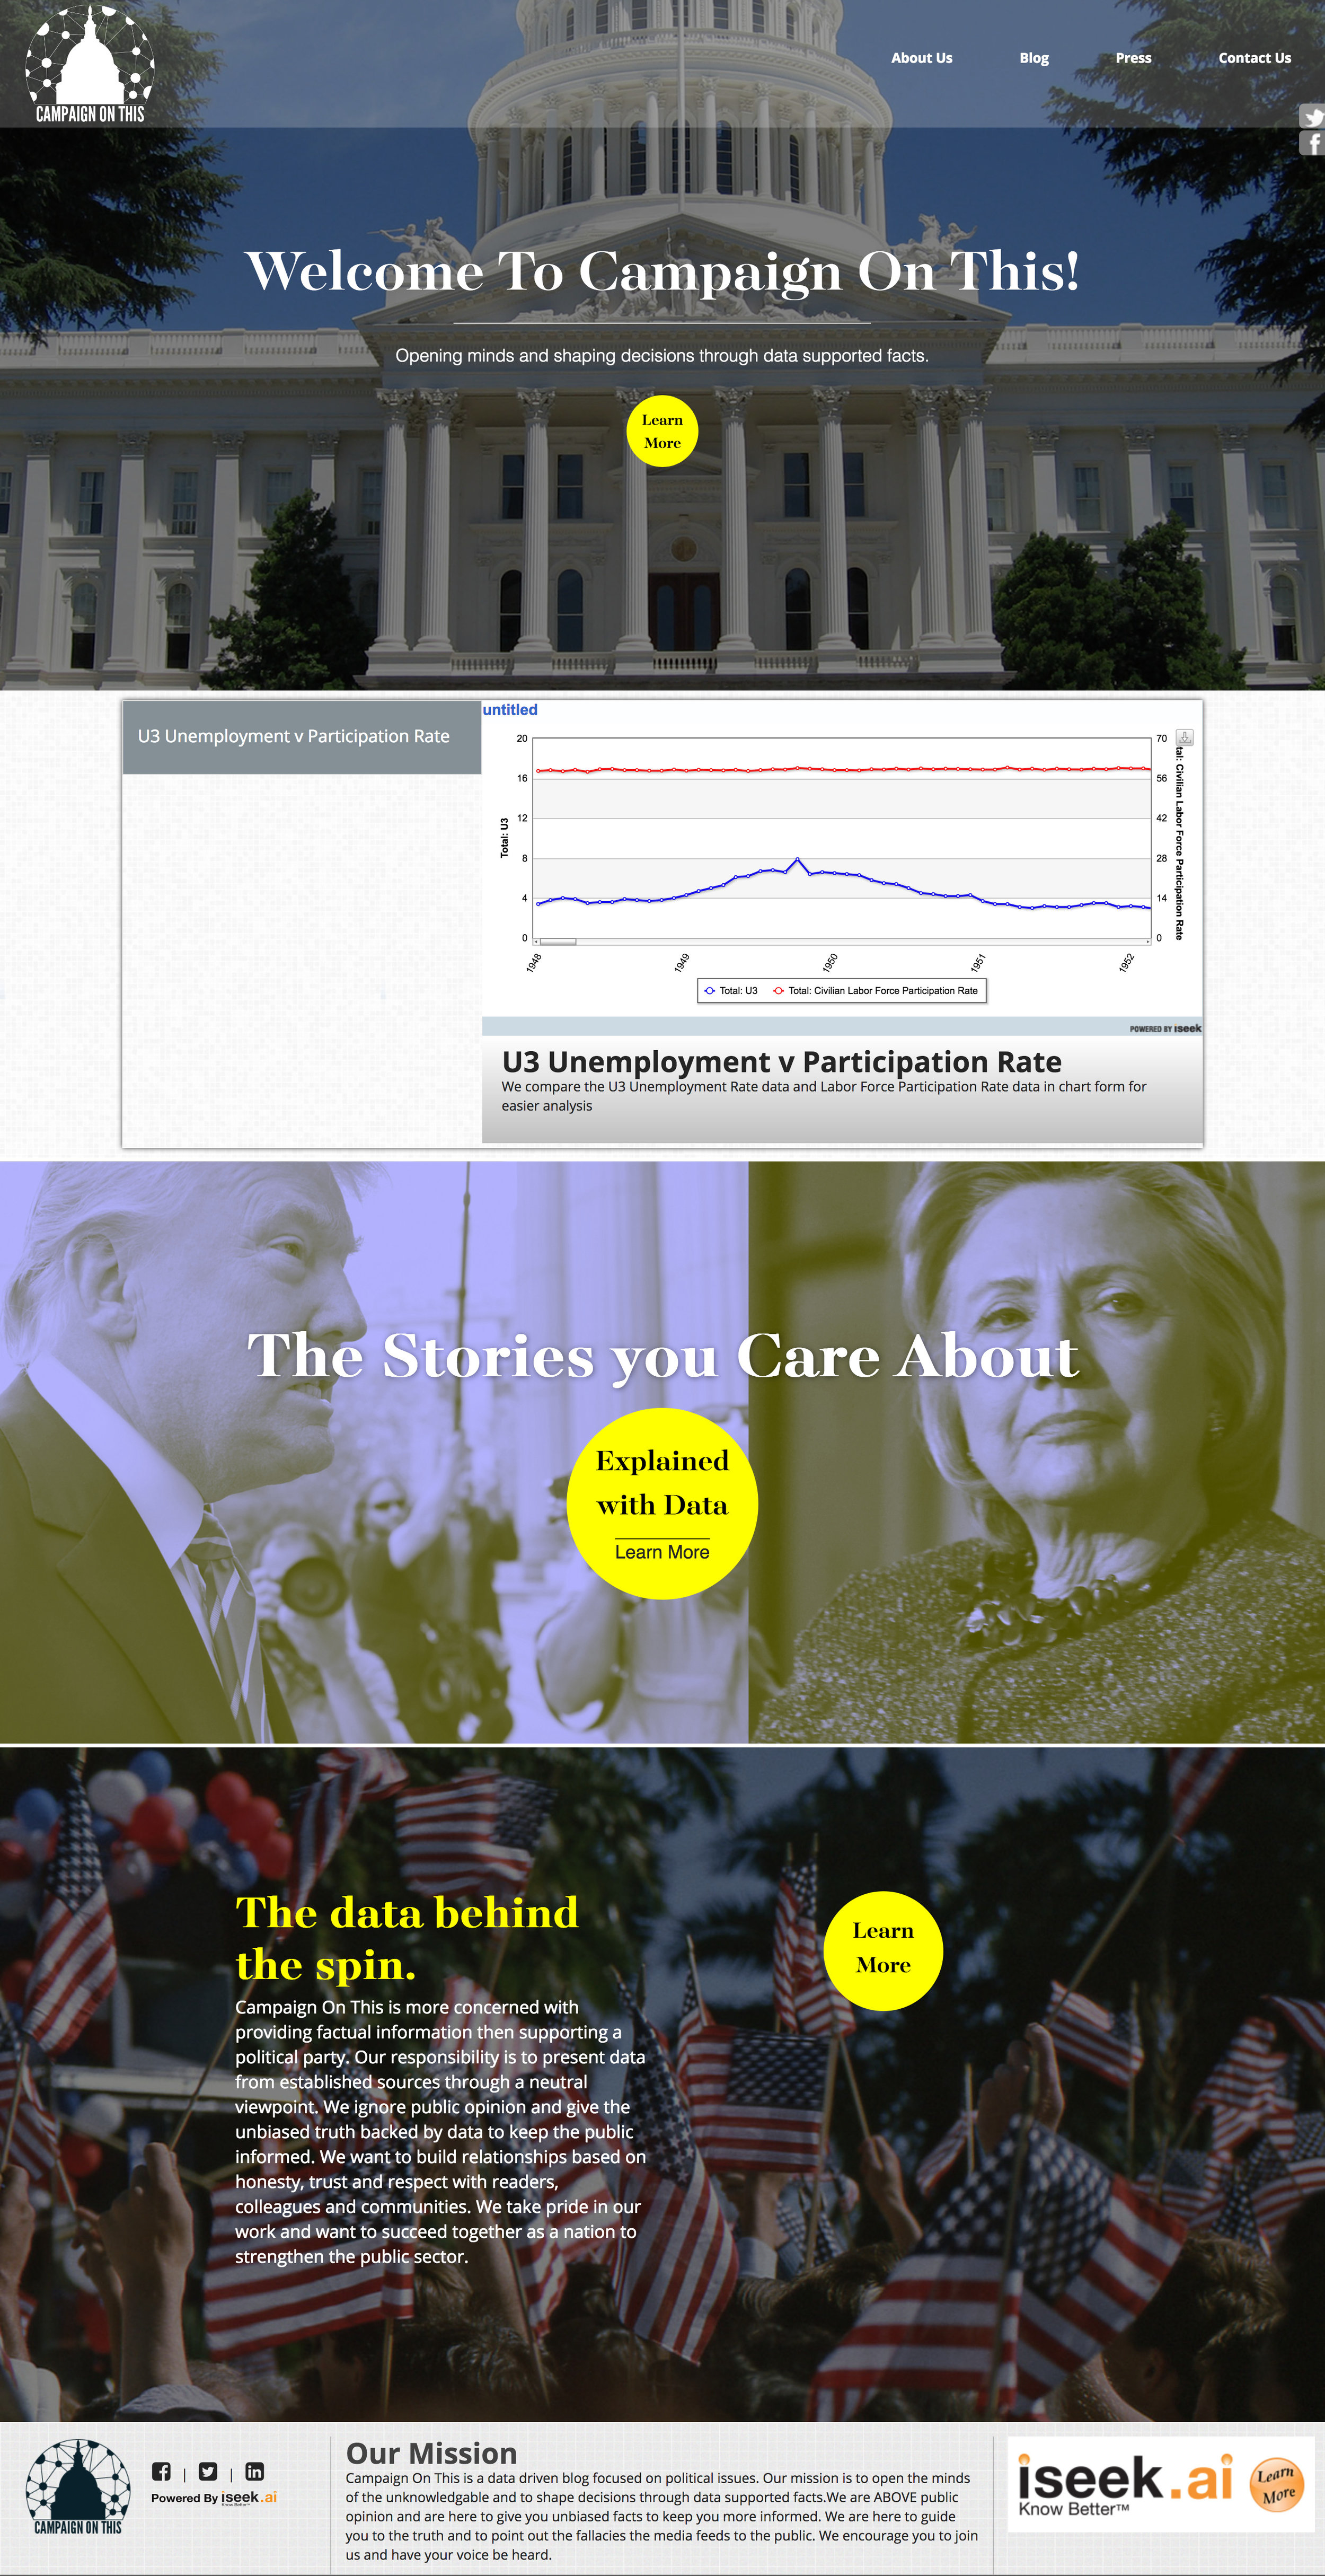 Screenshot-2018-1-30 Campaign On This(1).jpg